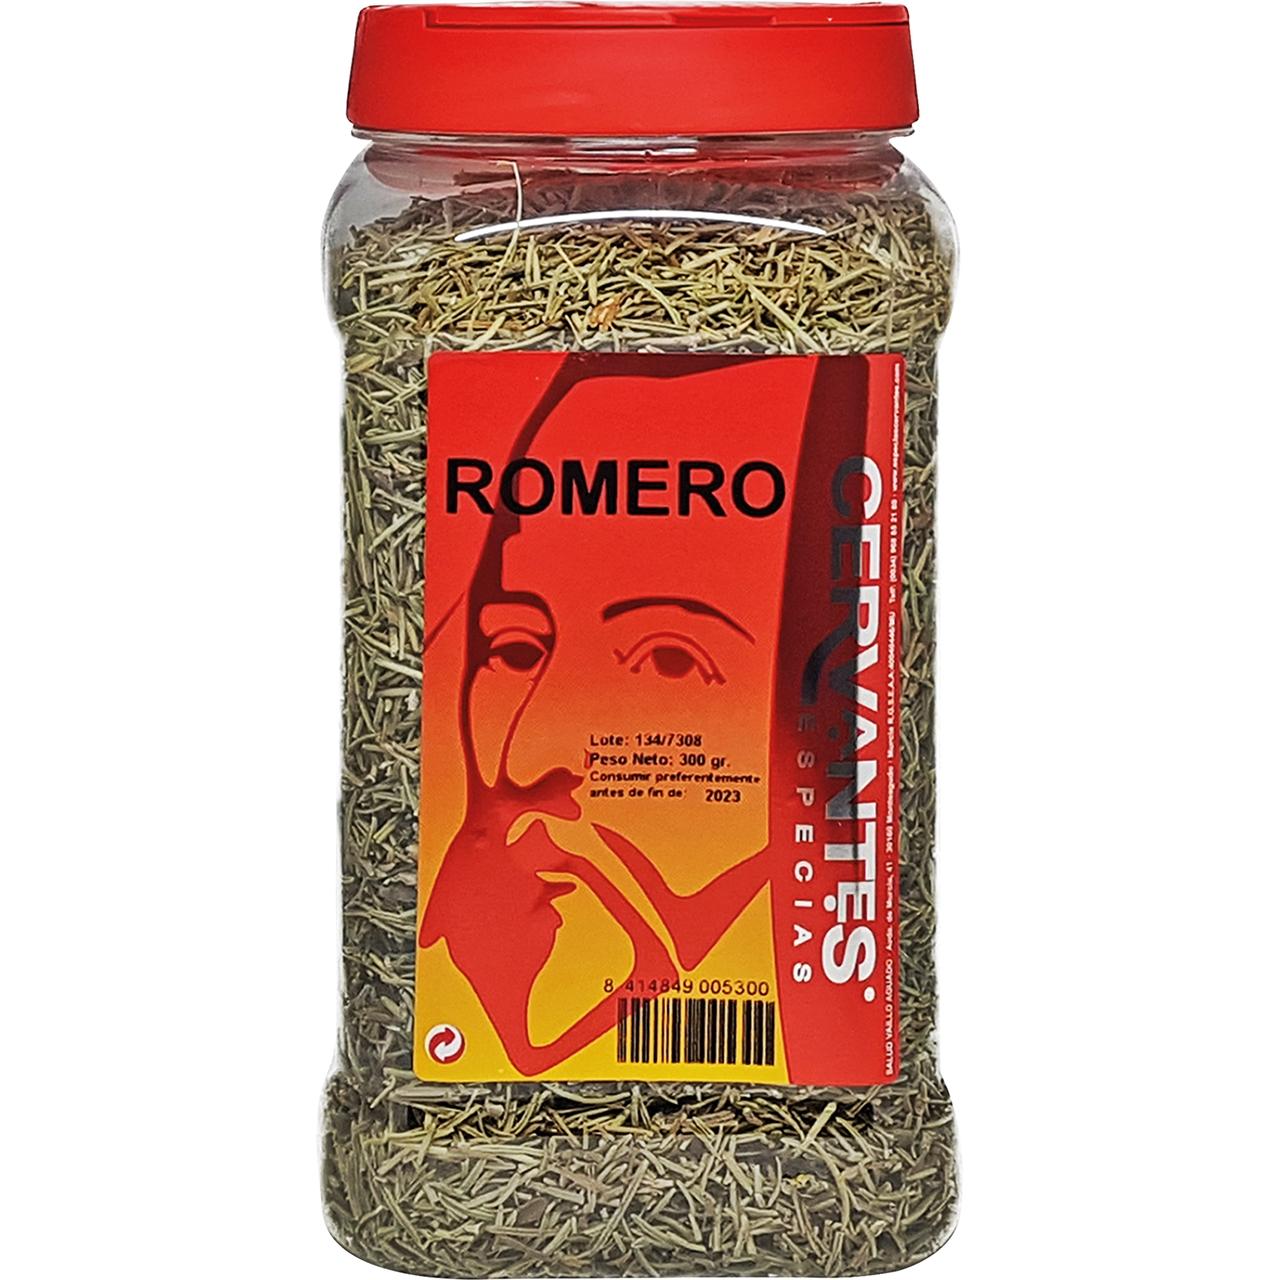 Romero 300gr. Cervantes